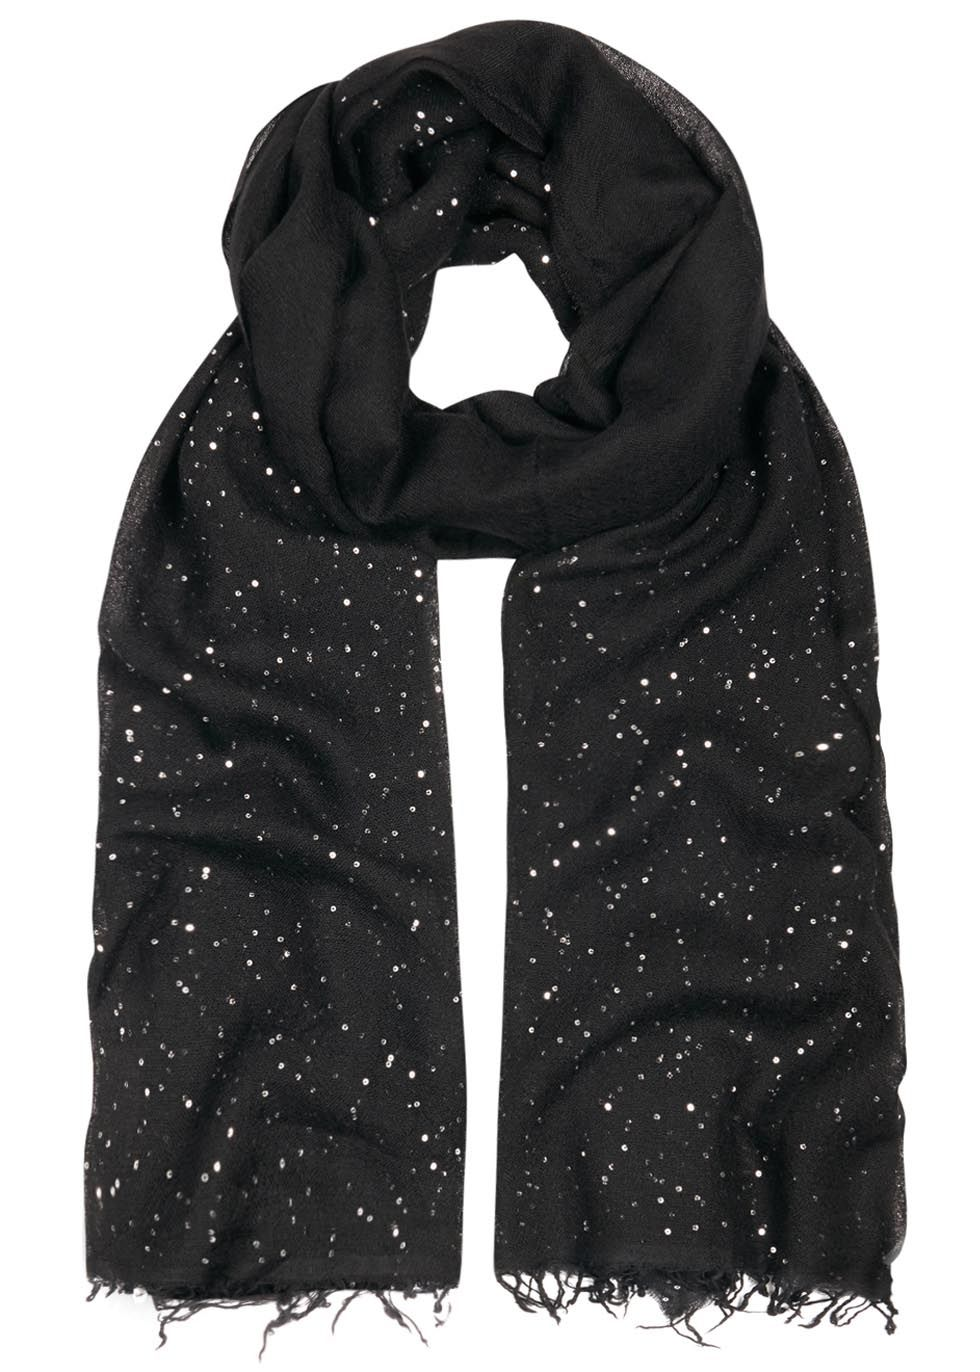 27b4c4c871ab3 Faliero Sarti black cashmere blend scarf Sequinned, frayed edges 50%  cashmere, 28% silk, 14% virgin wool, 8% polyester